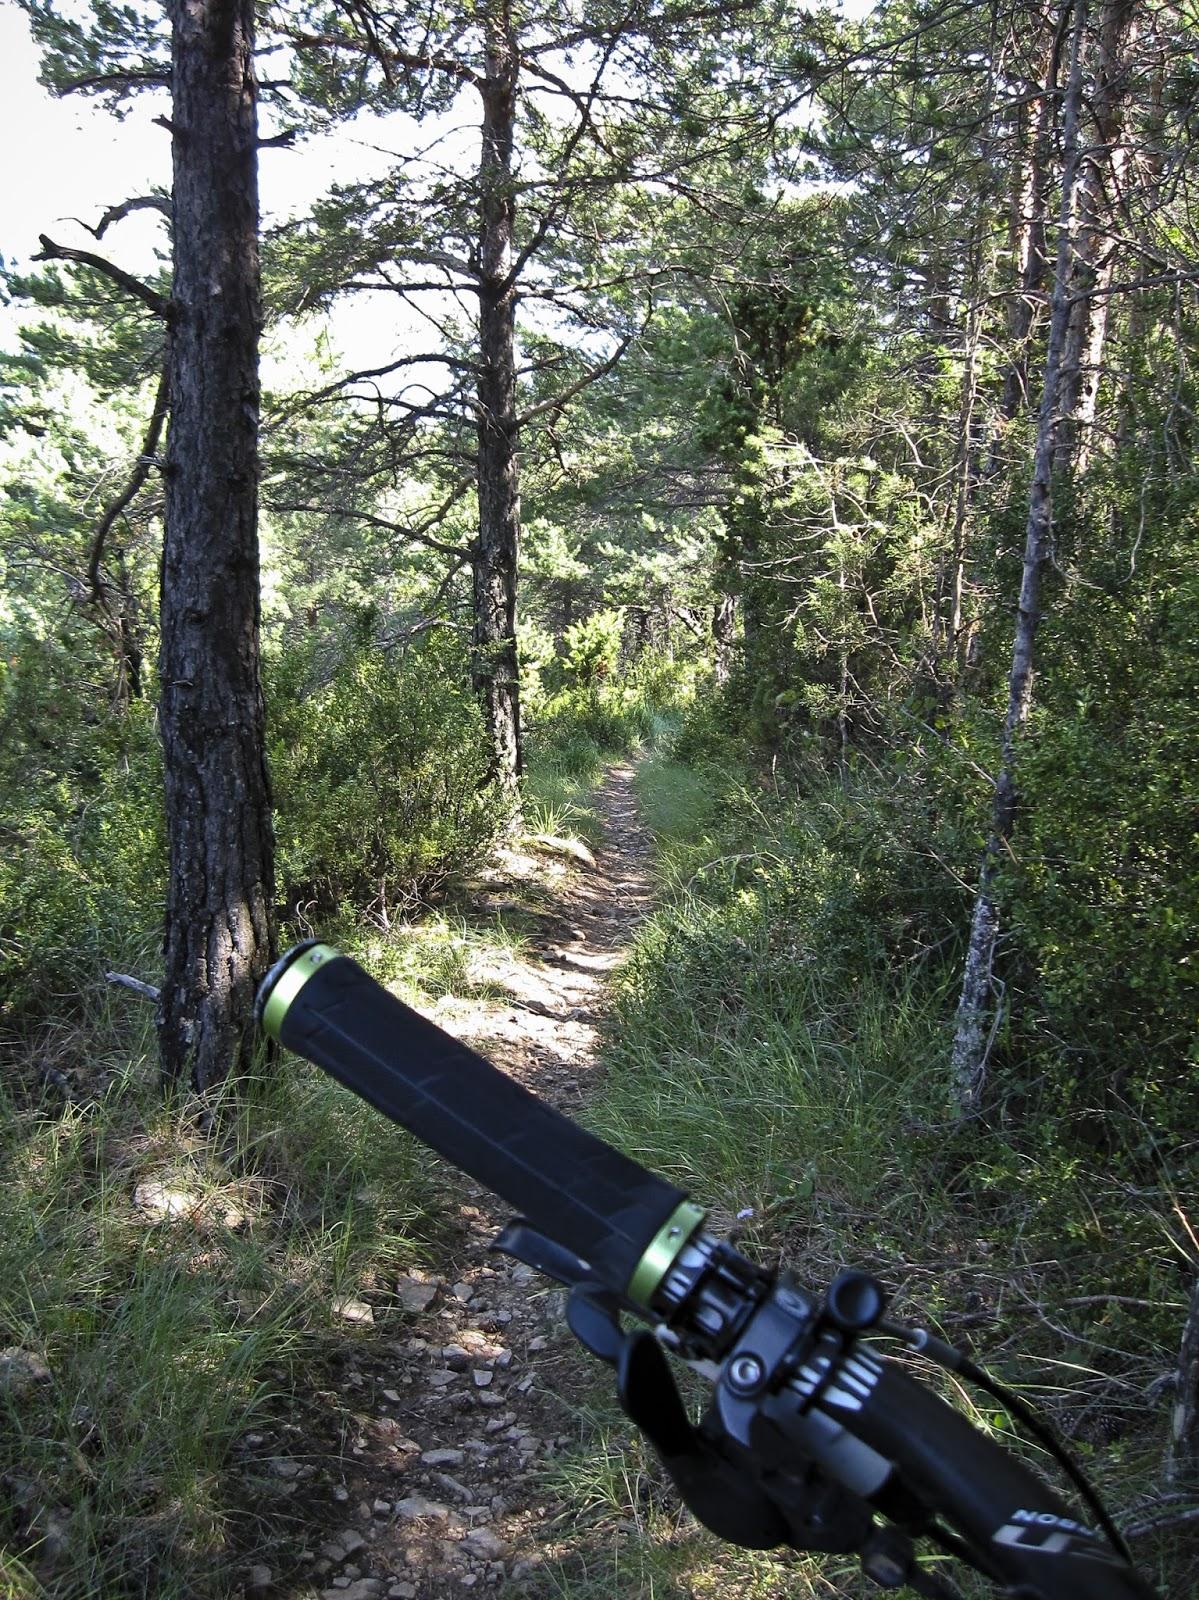 ciclismo, mtb, mountain bike, enduro